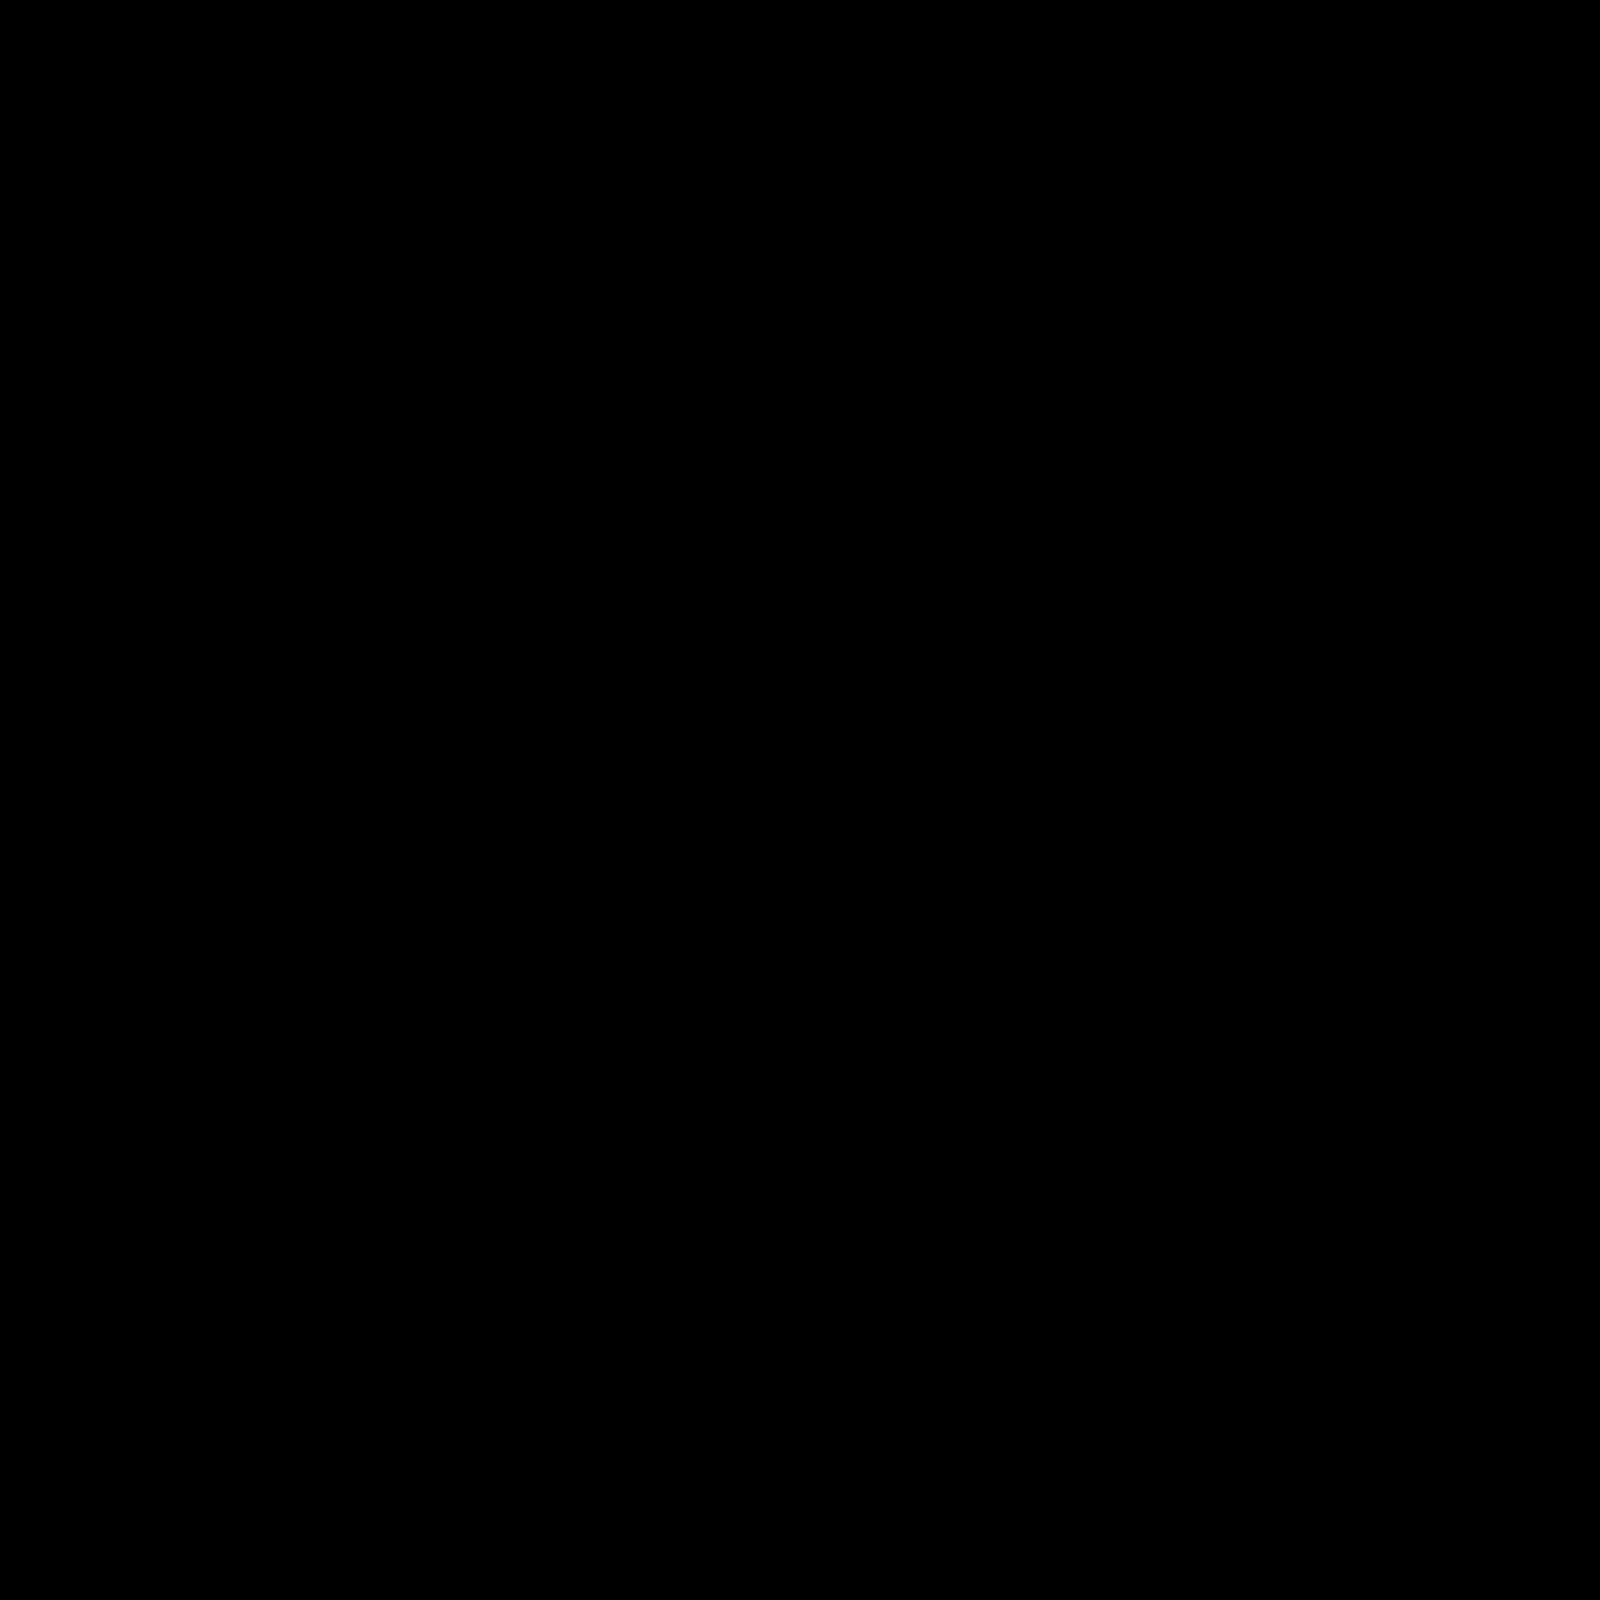 png black and white Logo Google Icono